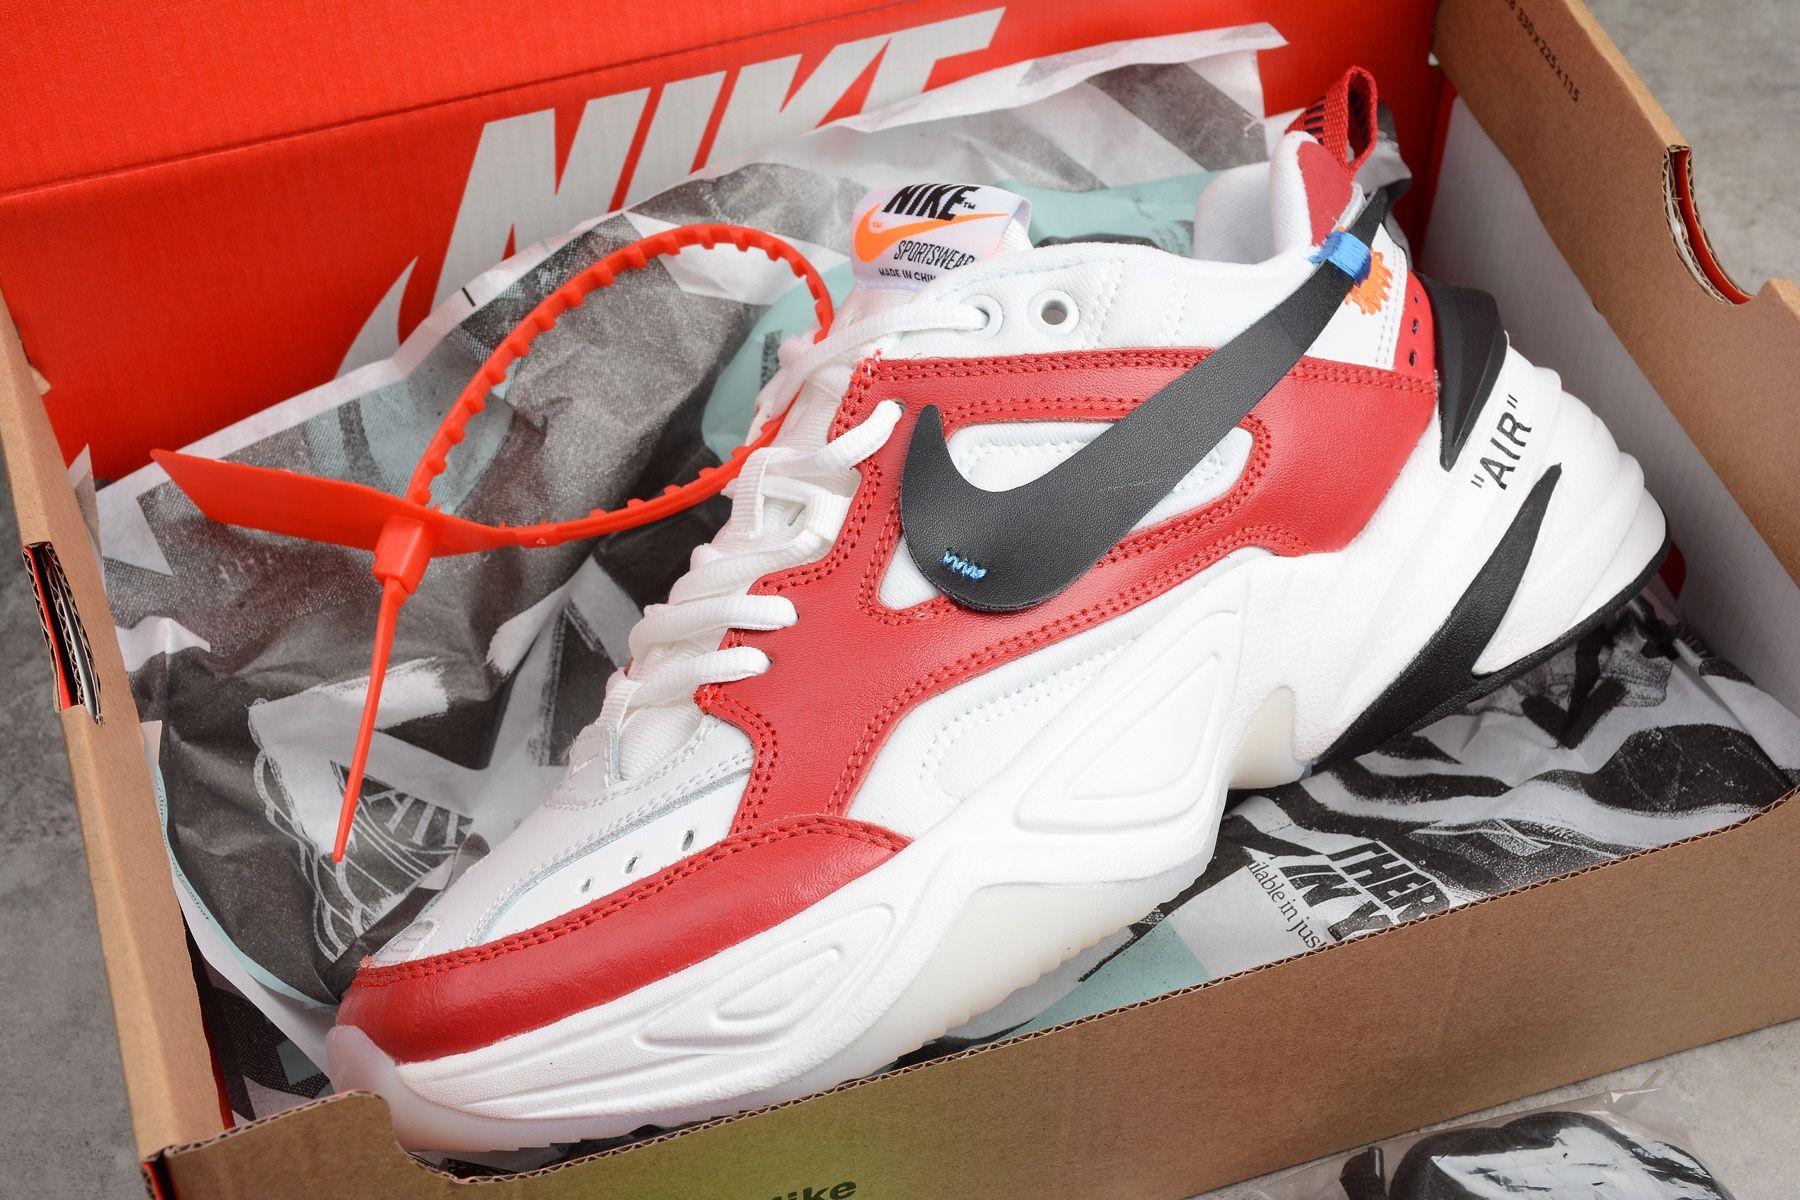 578ca36a66a Latest OFF-WHITE x Nike M2K Tekno Red White Black A03108-060